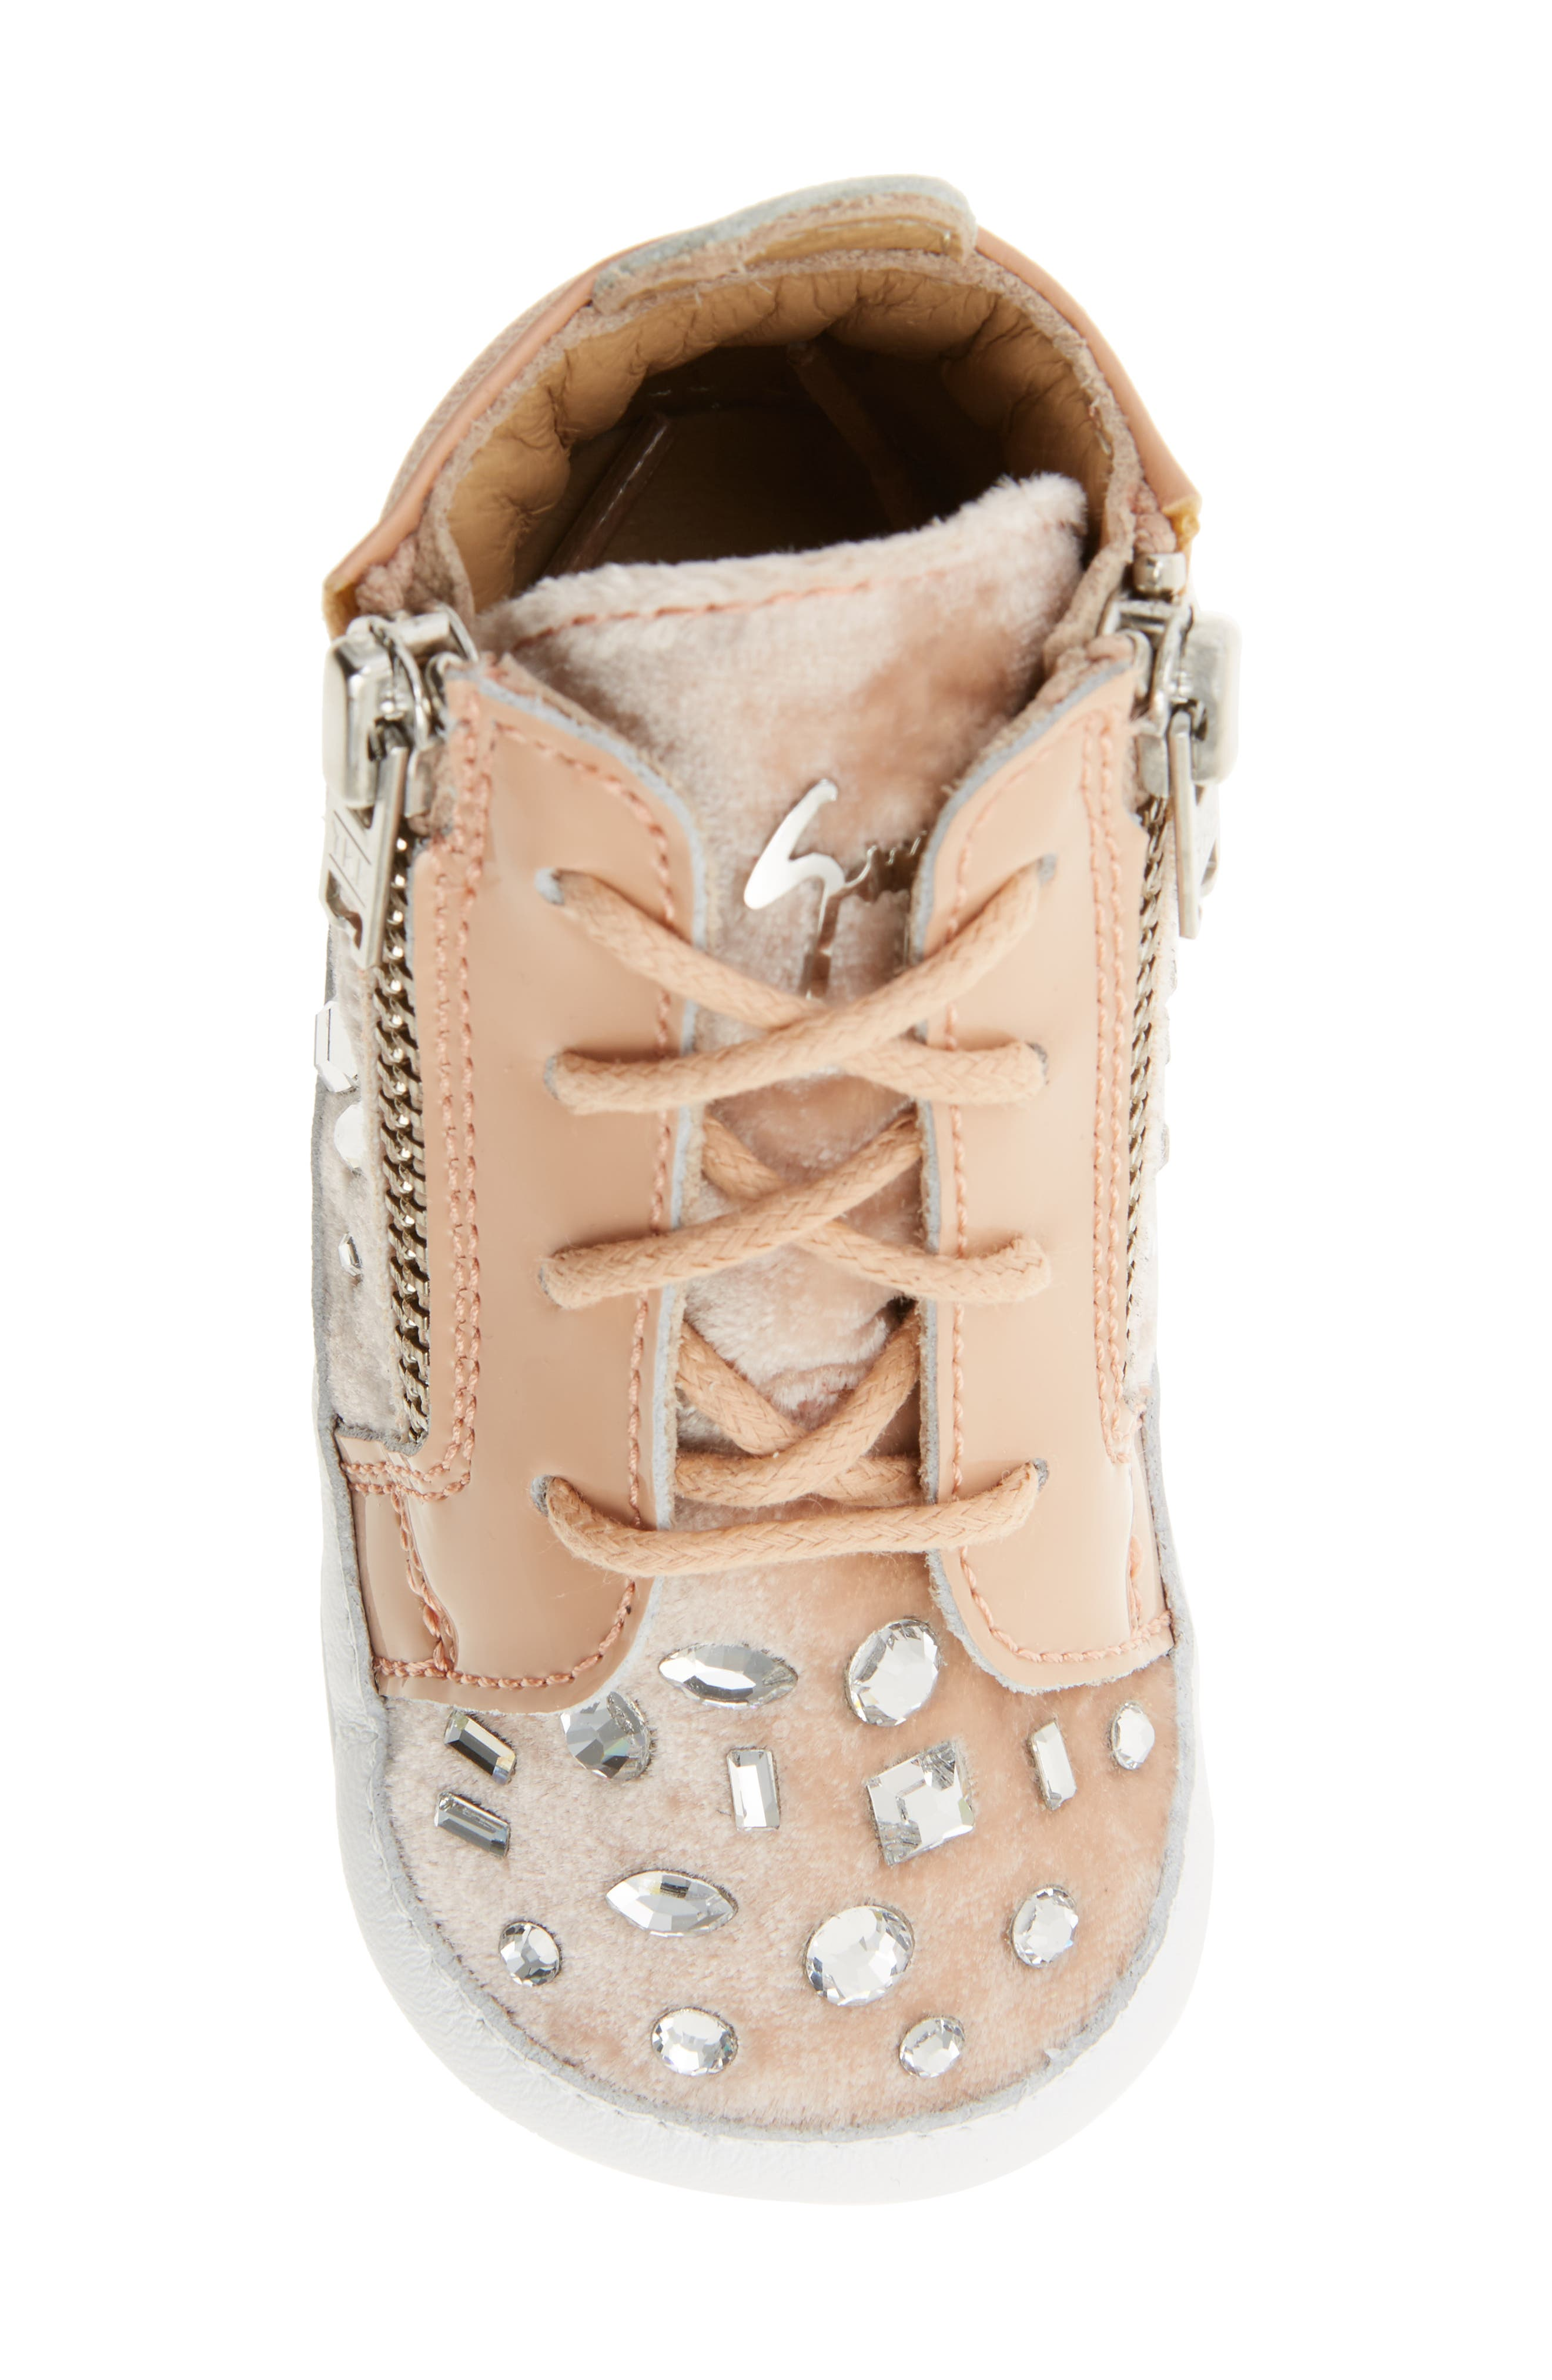 Veronica Embellished Sneaker,                             Alternate thumbnail 5, color,                             CIPRIA